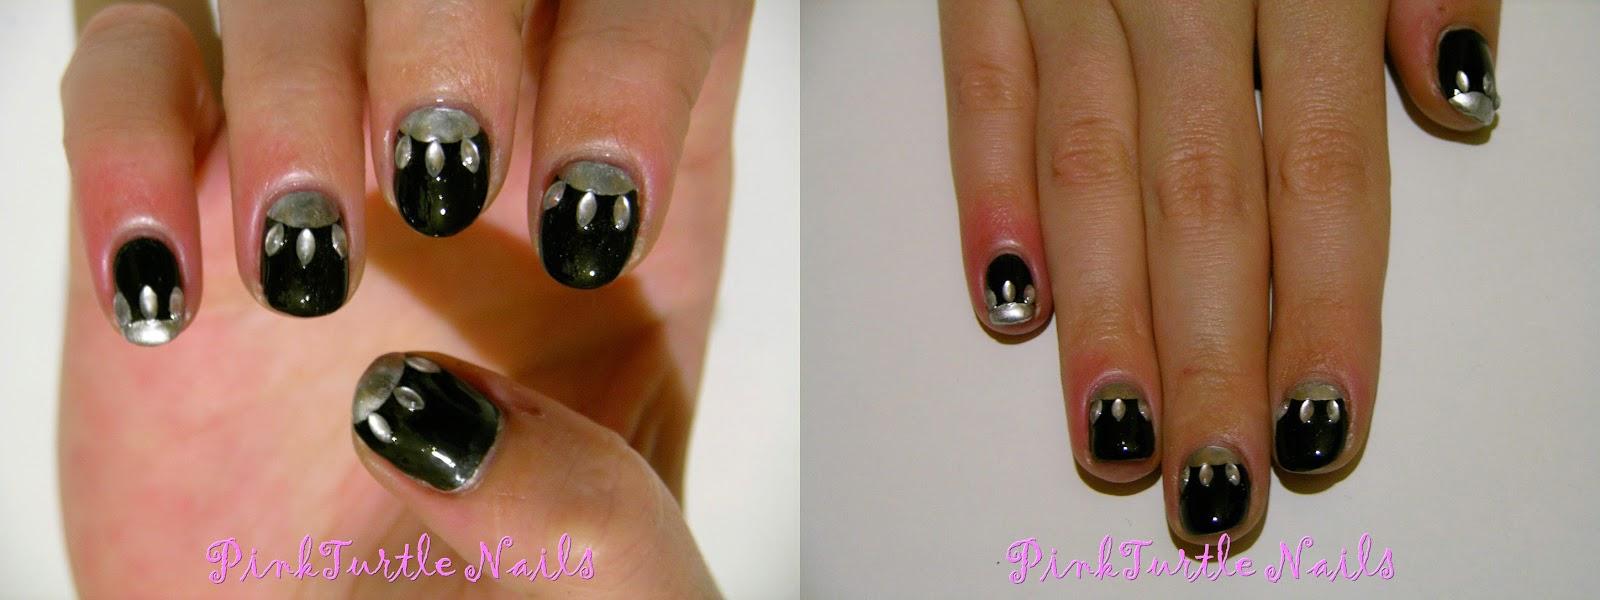 http://pinkturtlenails.blogspot.com.es/2015/03/reto-31-dias-media-luna.html